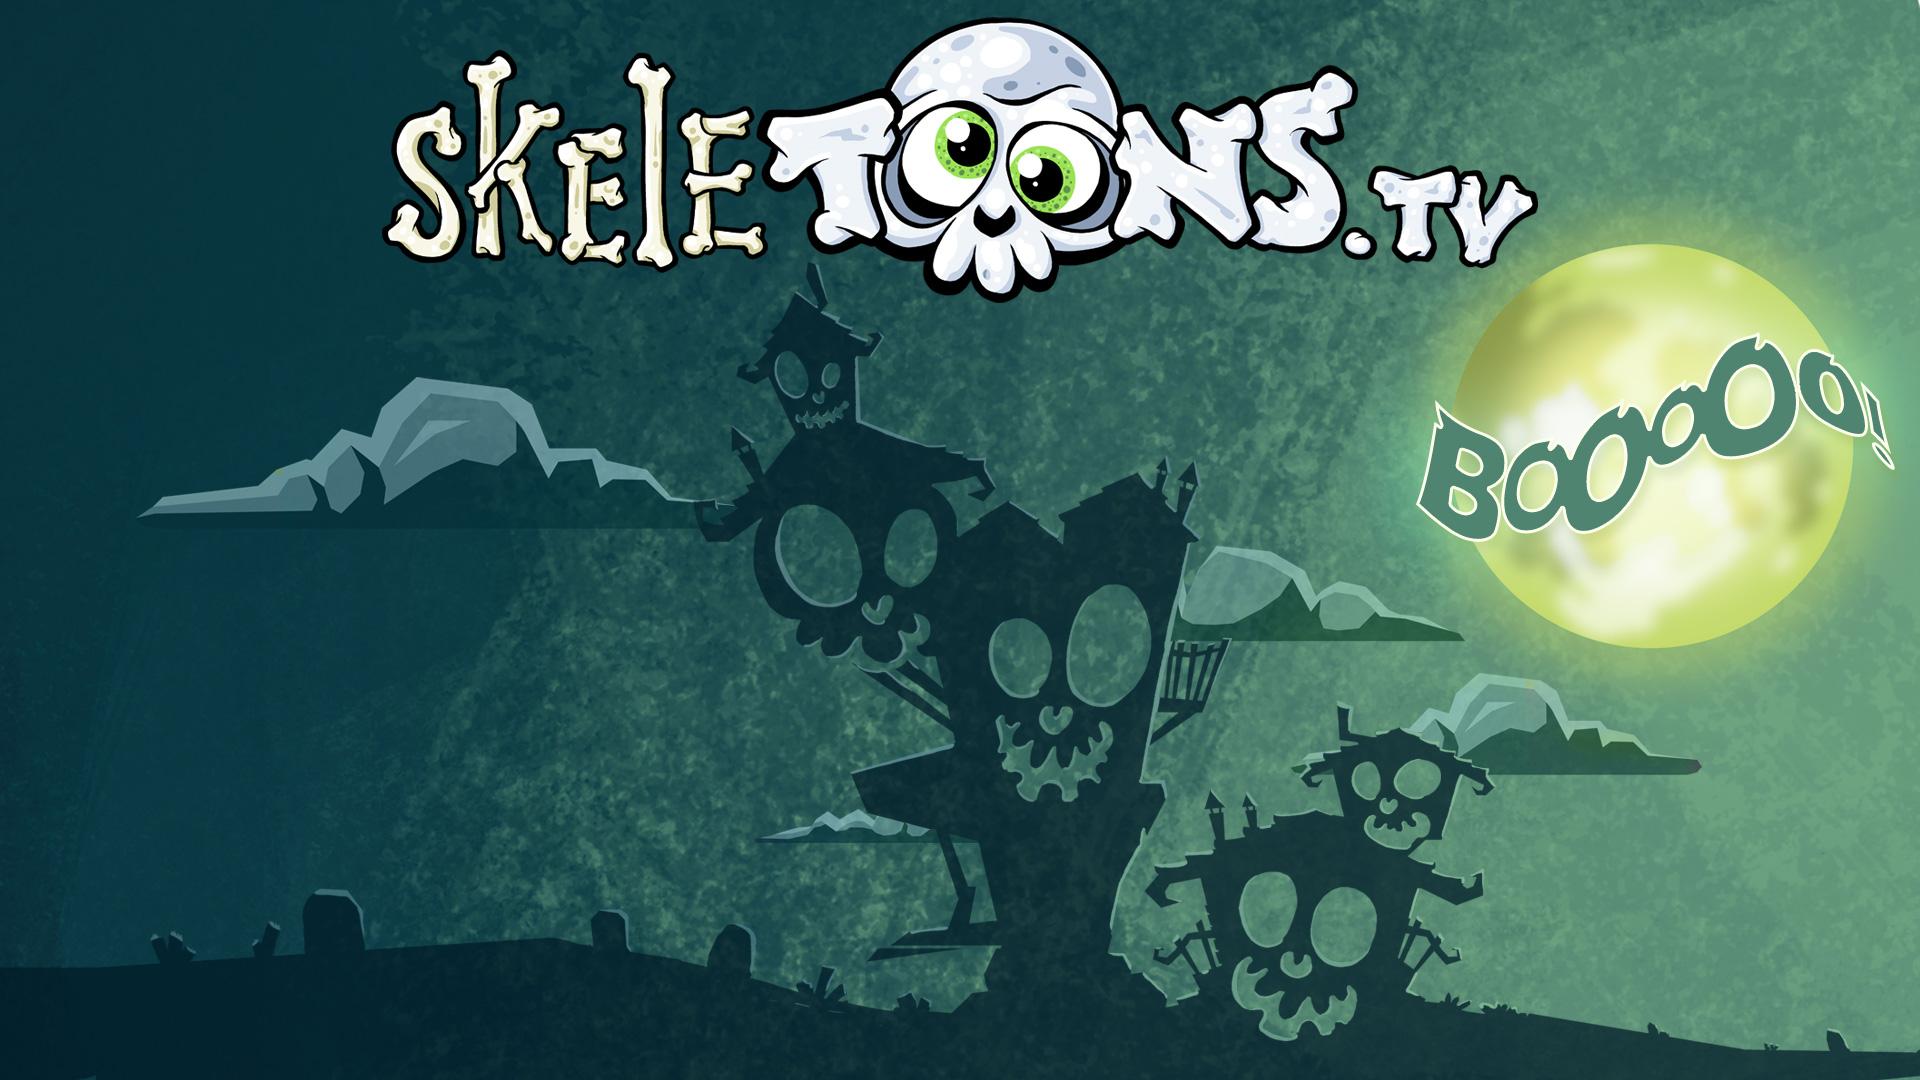 skeletoons_1920